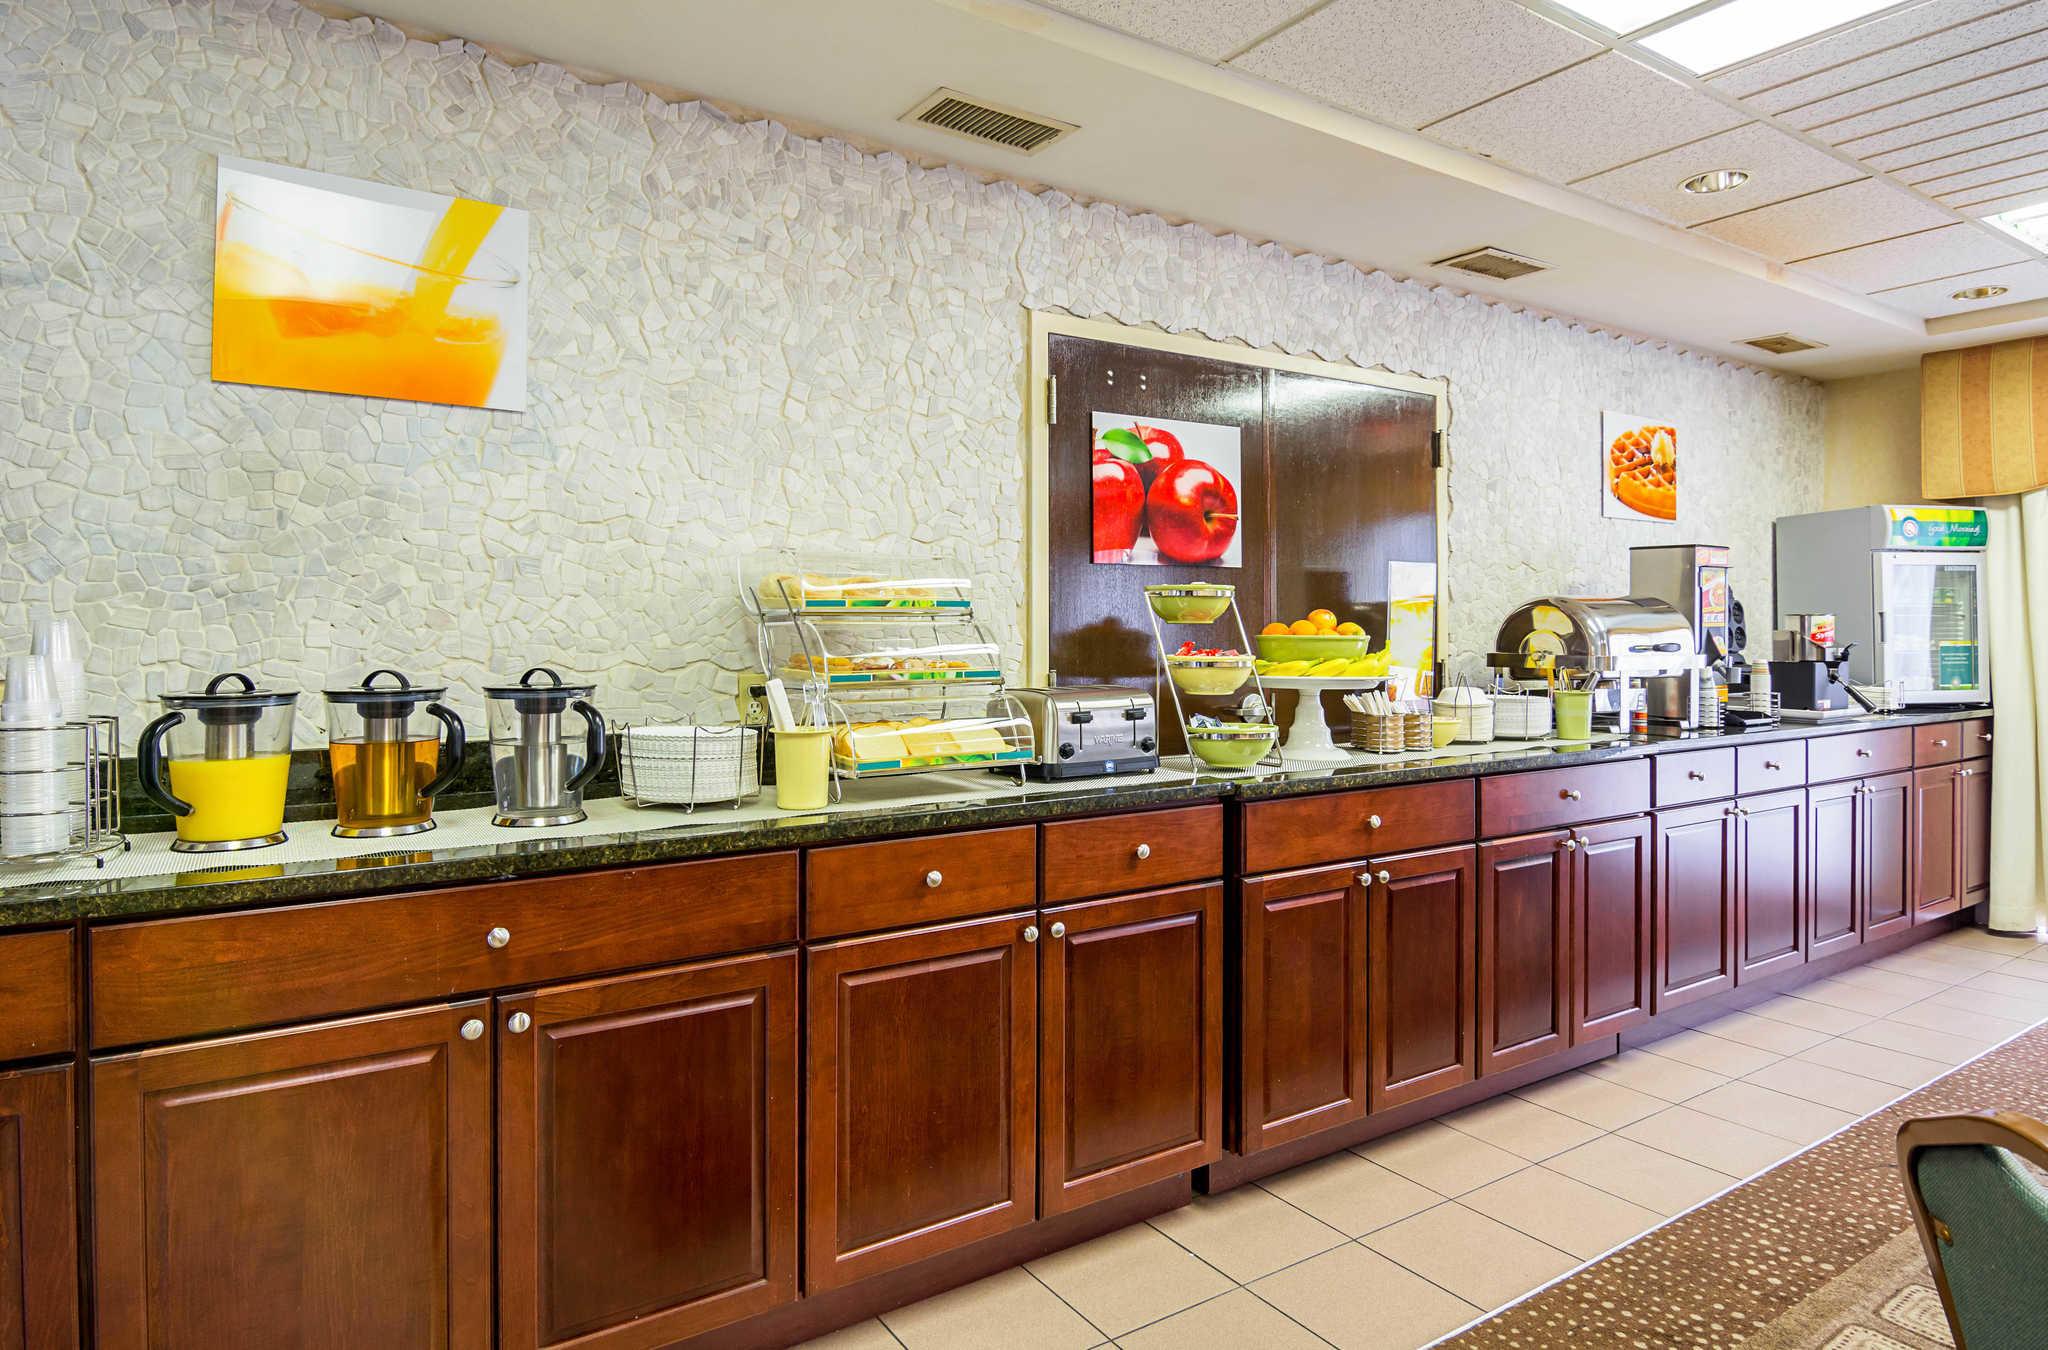 Quality Inn & Suites Kearneysville - Martinsburg image 20